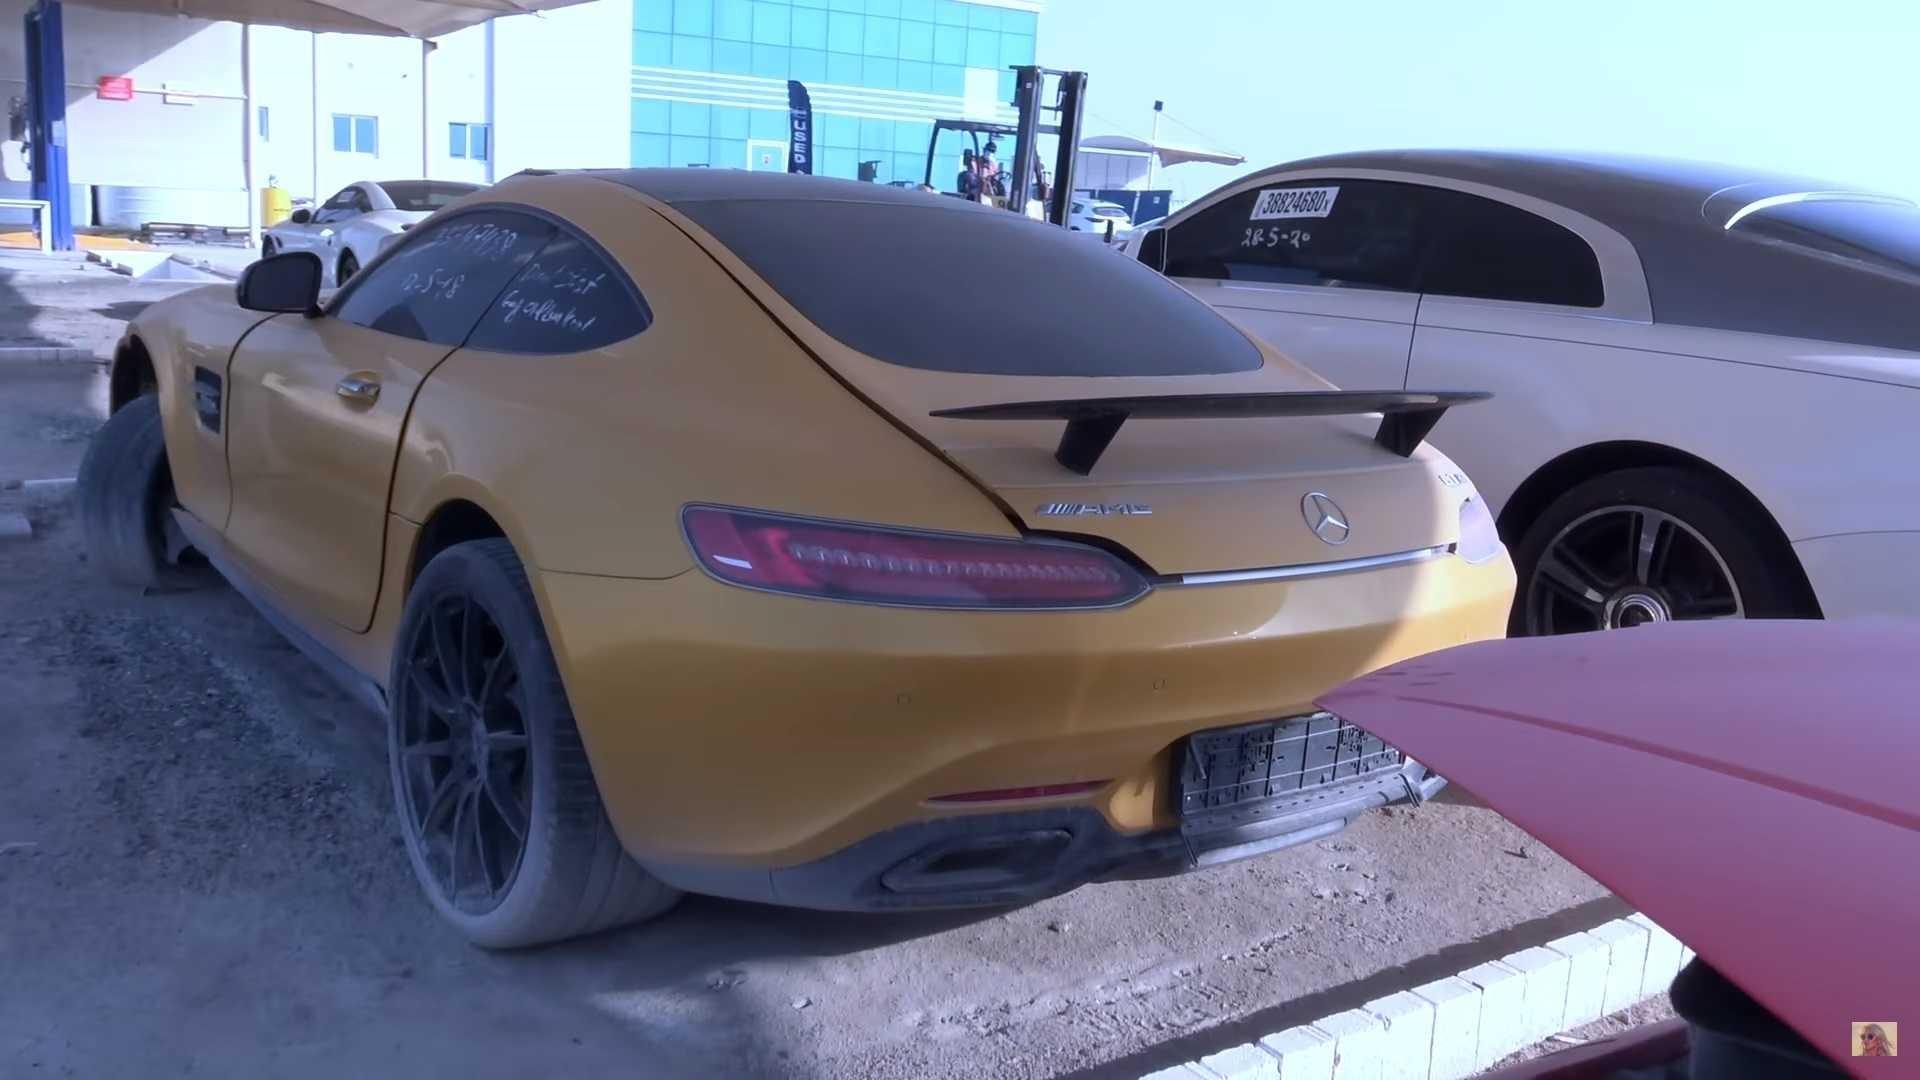 Mercedes GTS in Dubai scrap yard